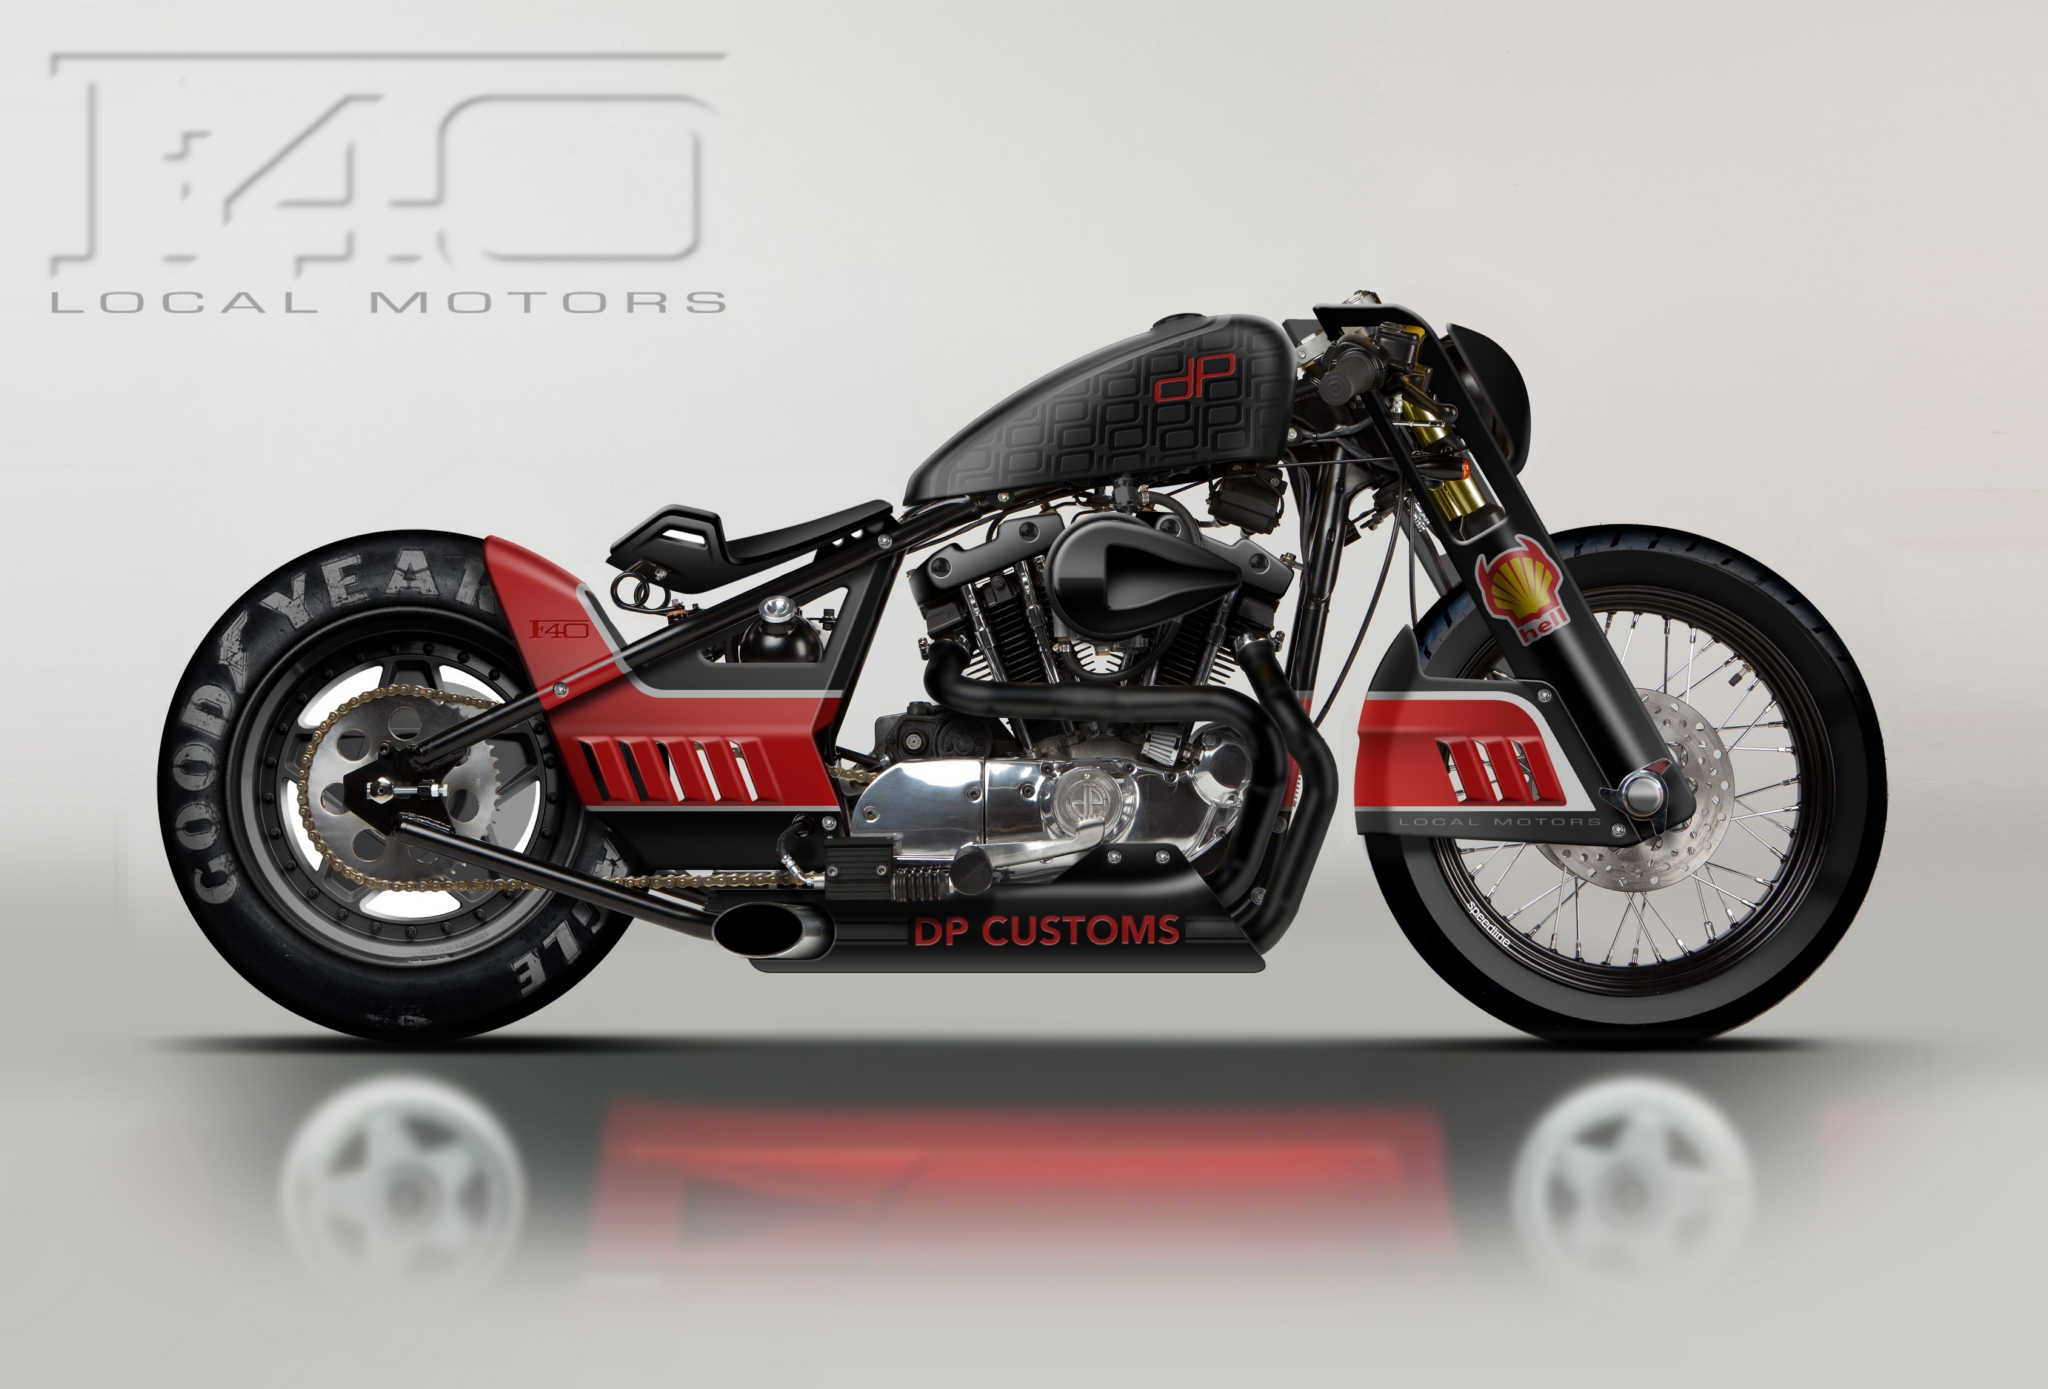 Ferrari F40-Inspired Harley-Davidson Concept - autoevolution